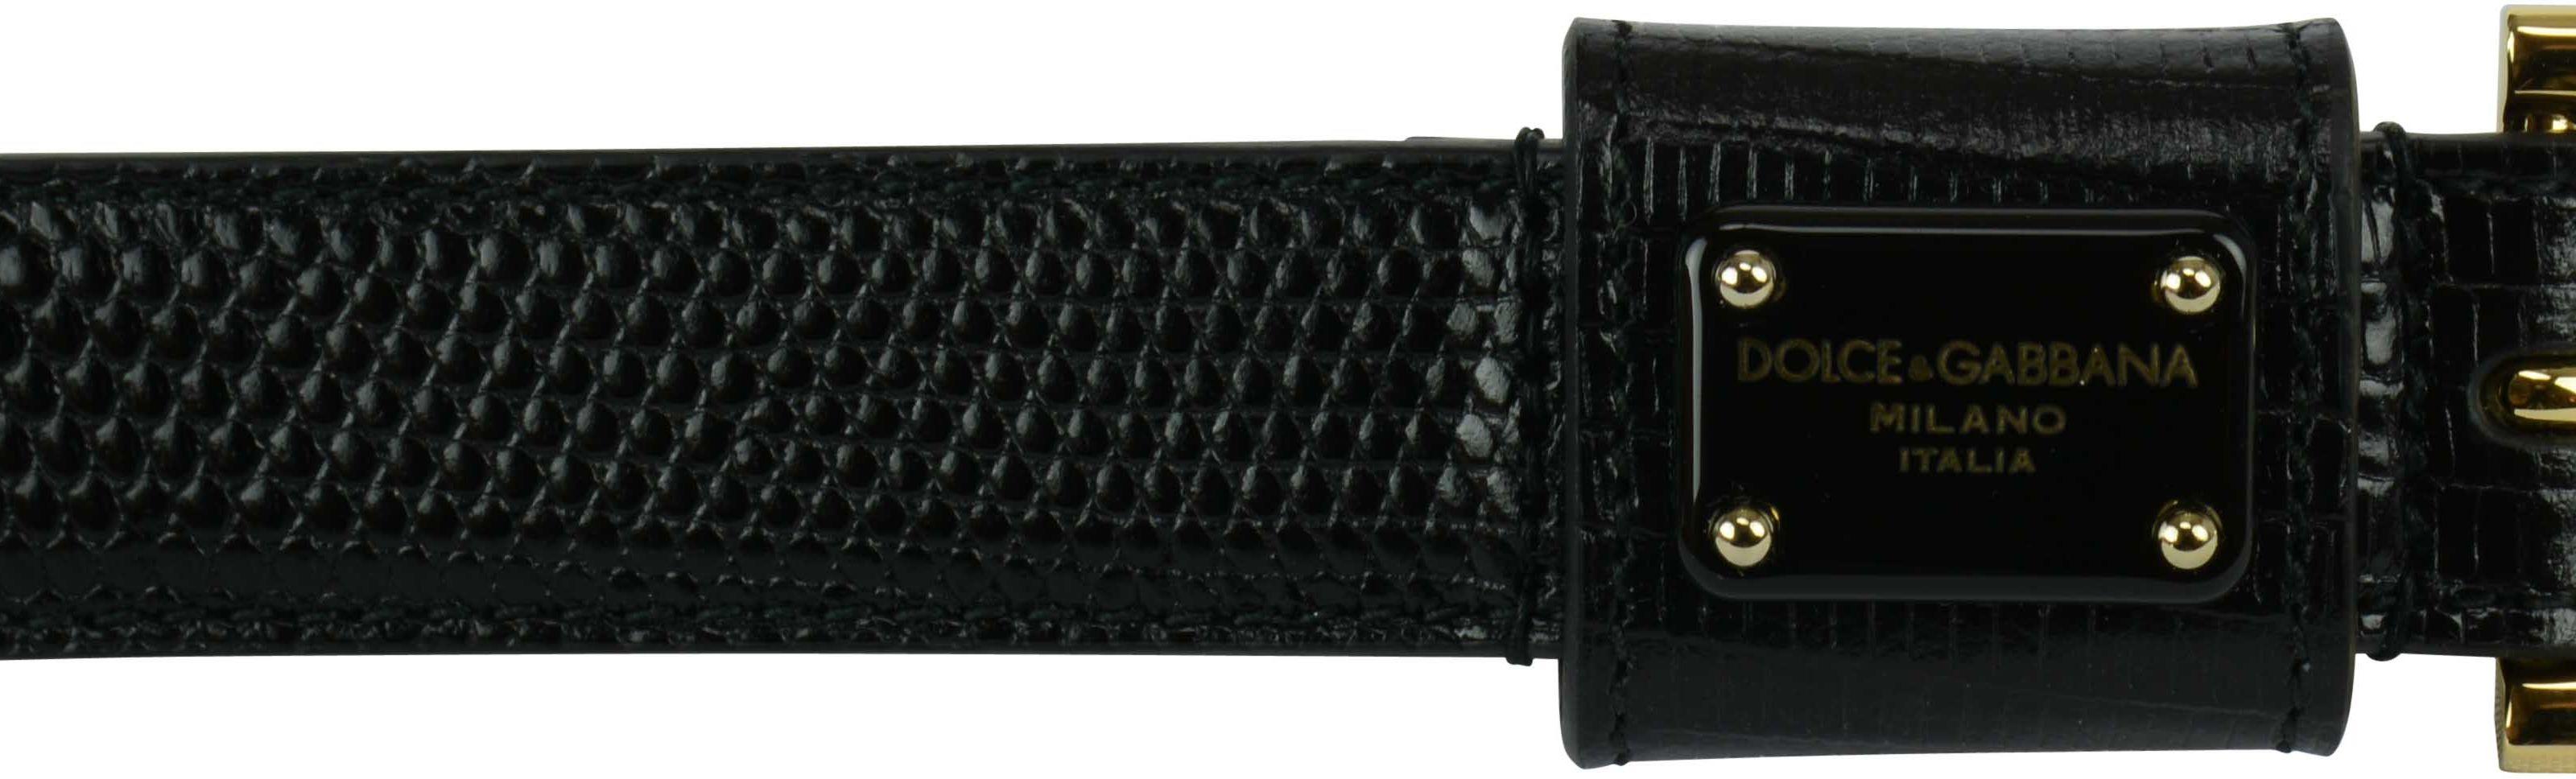 Dolce & Gabbana Man Belt